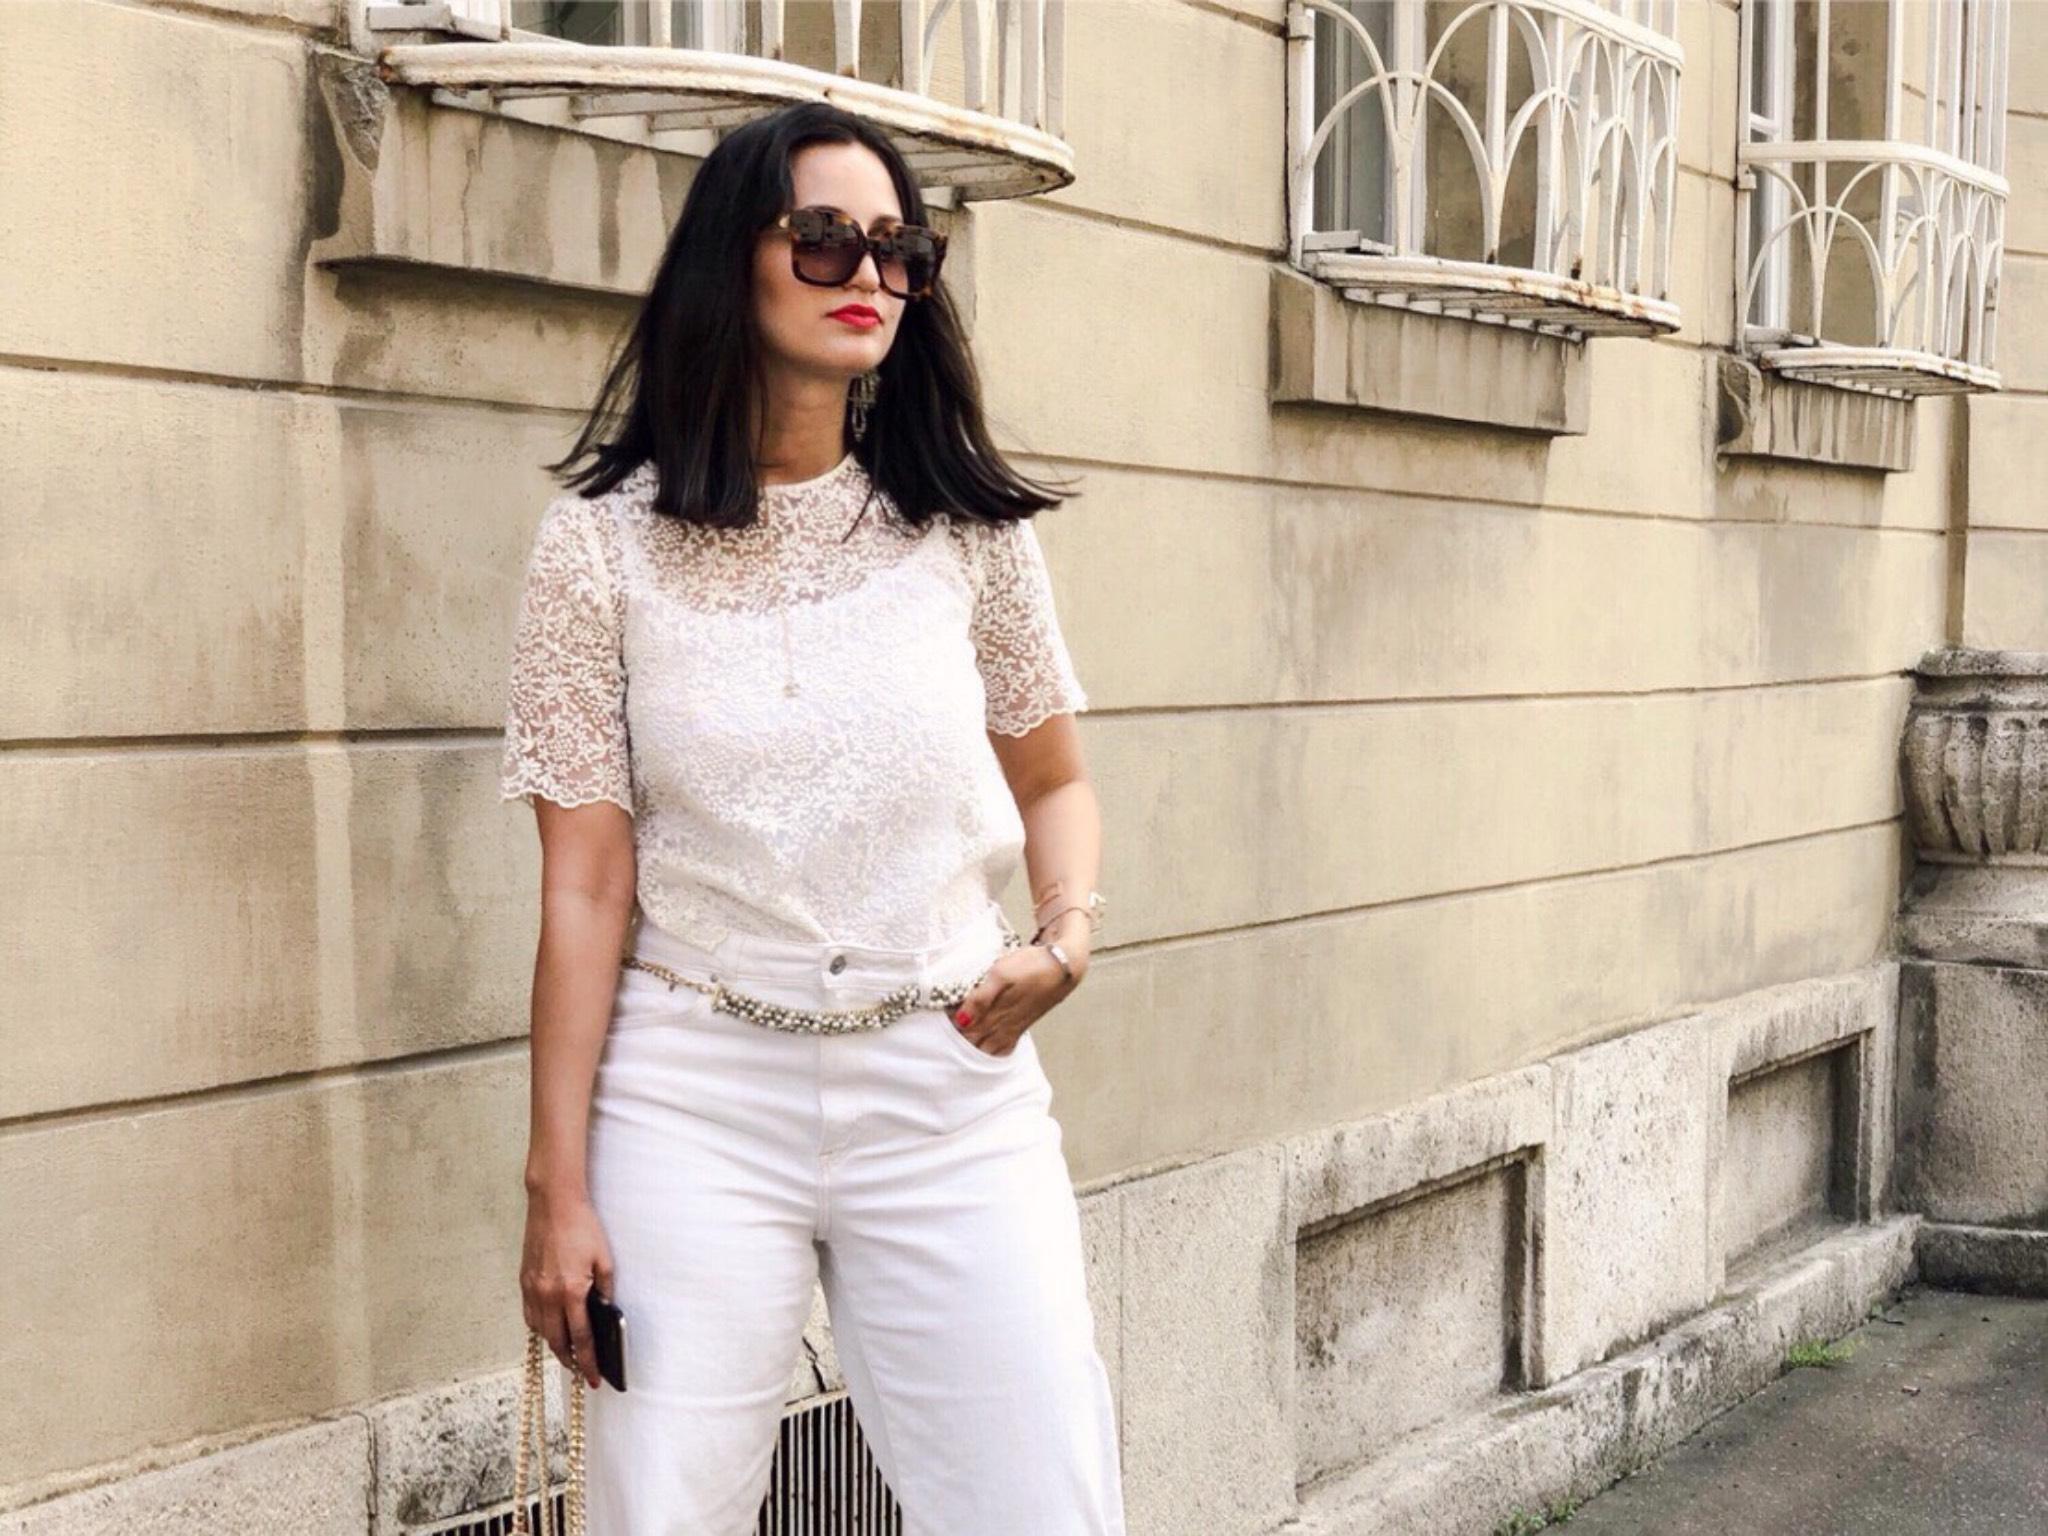 Annabelles Outfit Inspiration für die White Party am Stadtstrand. Foto: Lea Demir